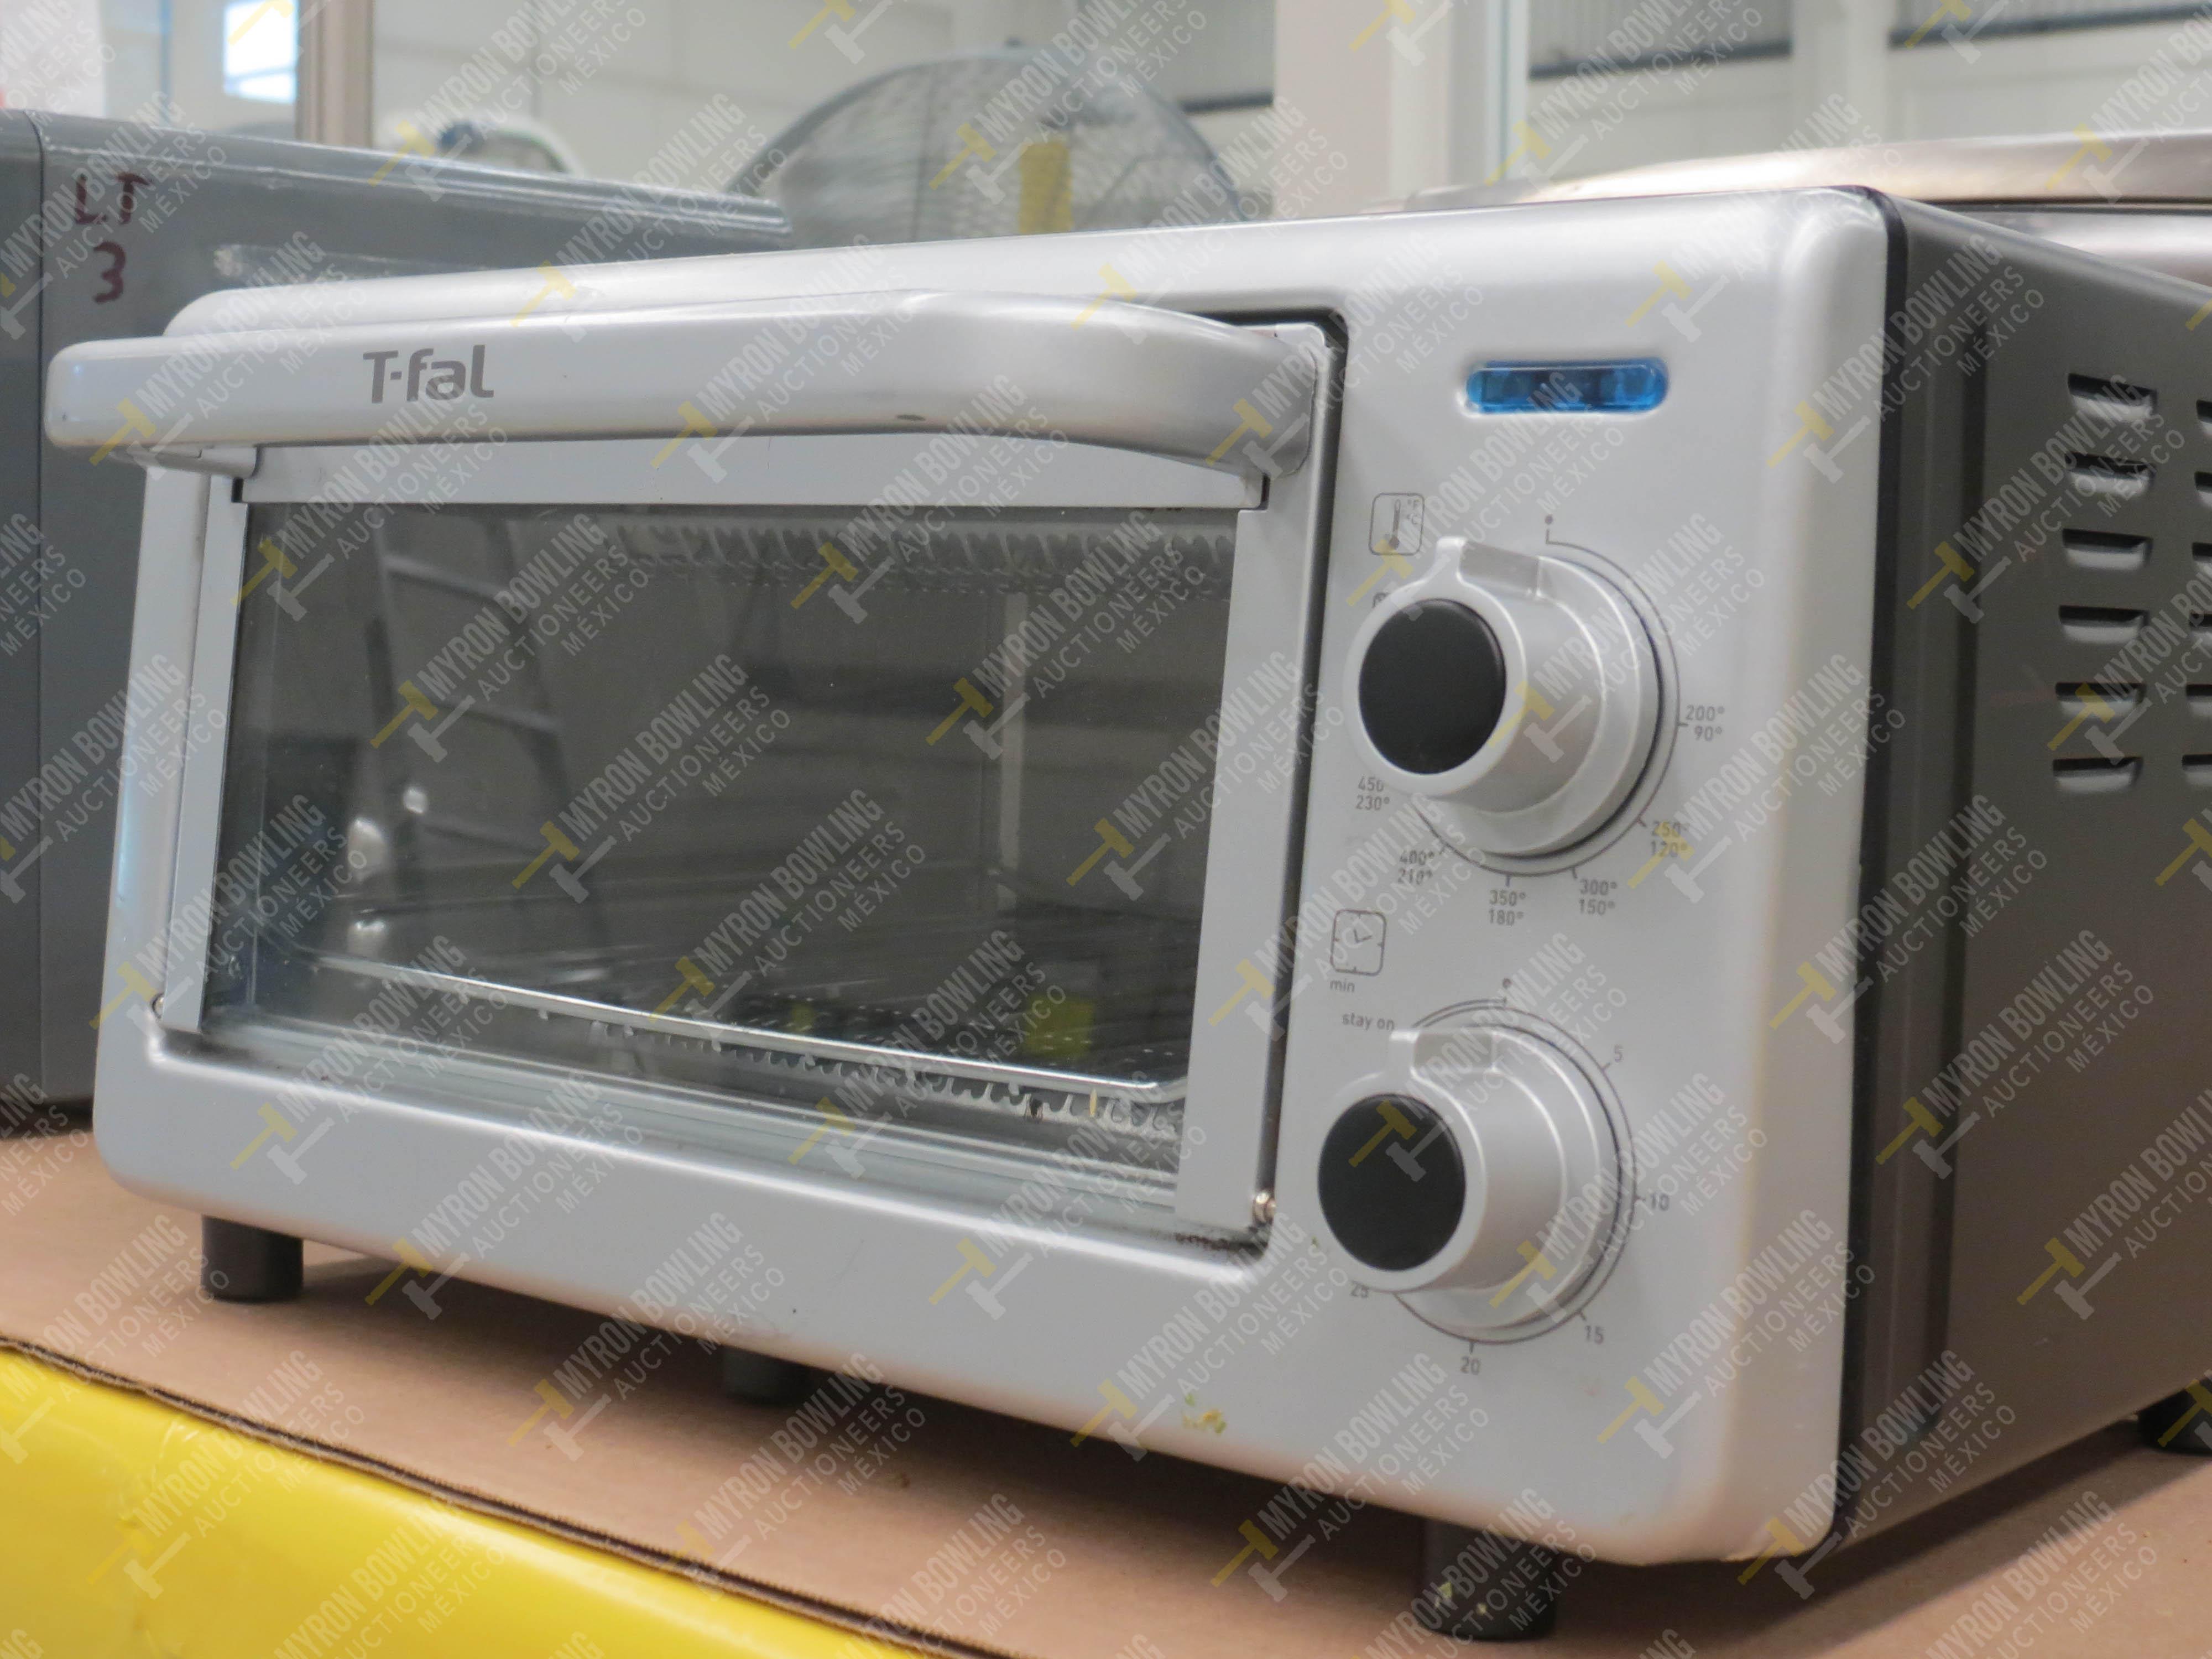 1 Horno eléctrico marca T-fal, Modelo OF160850 No. de Serie T066 y 1 Horno de microondas - Image 4 of 5